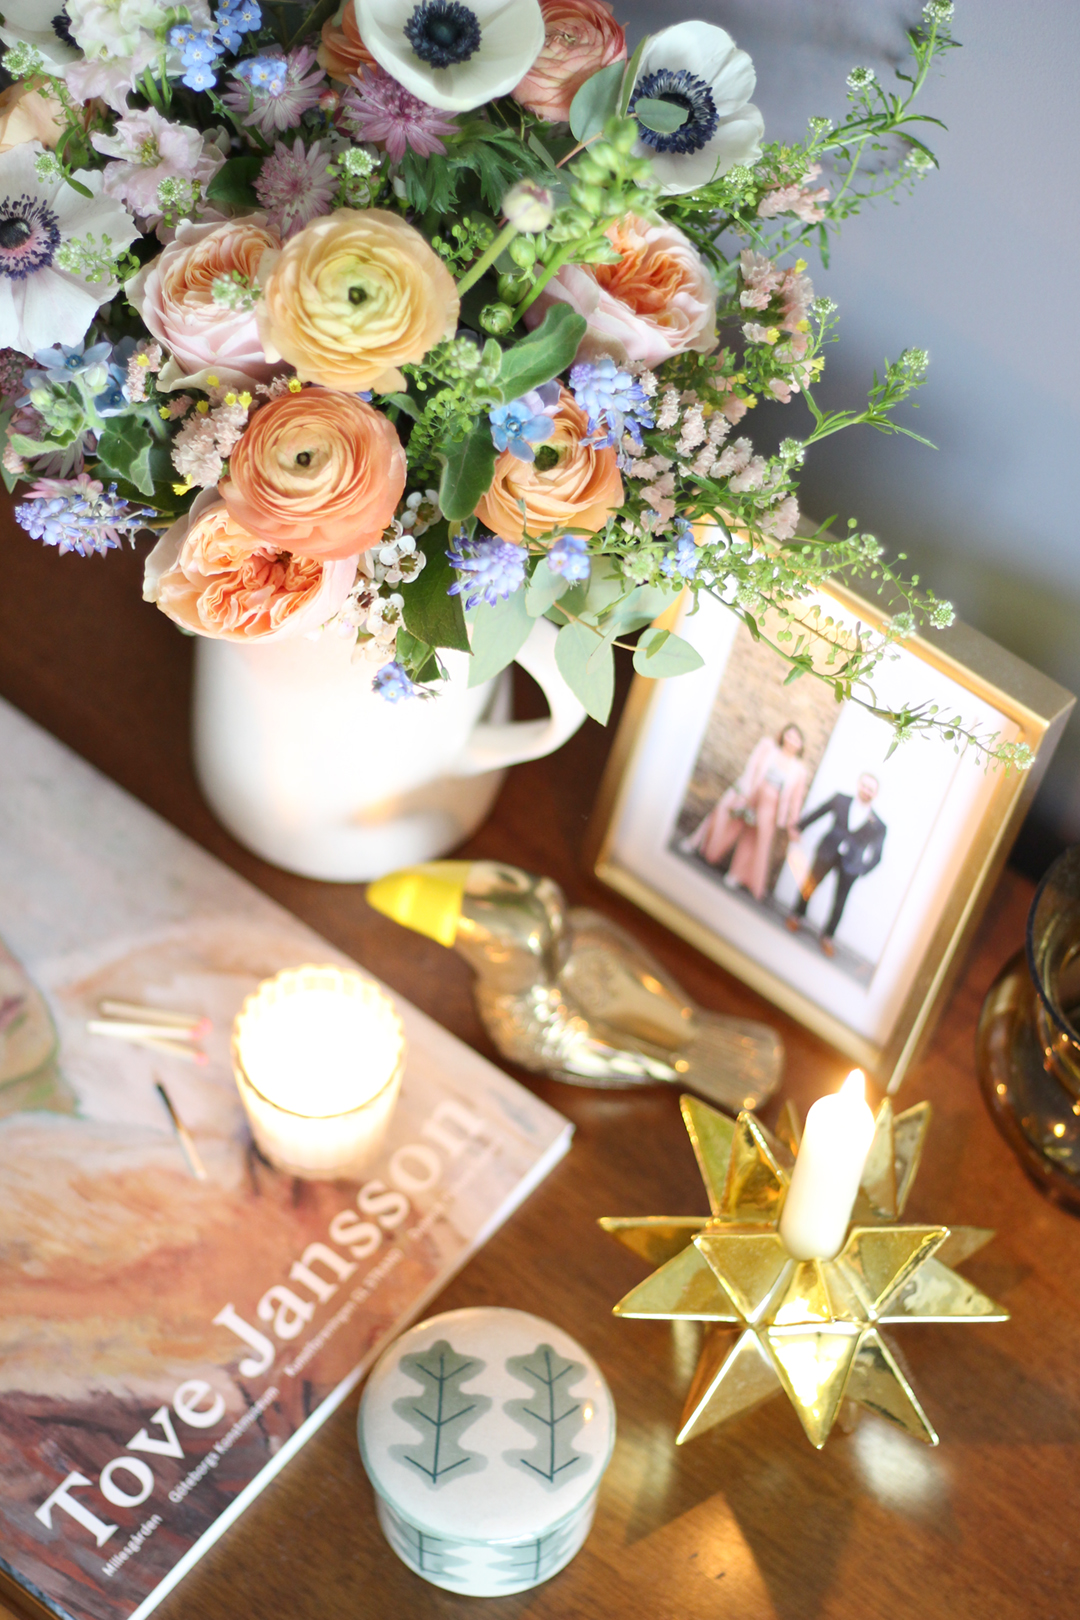 nancy-straughan-interior-stylist-bloom-and-burn-florist.jpg